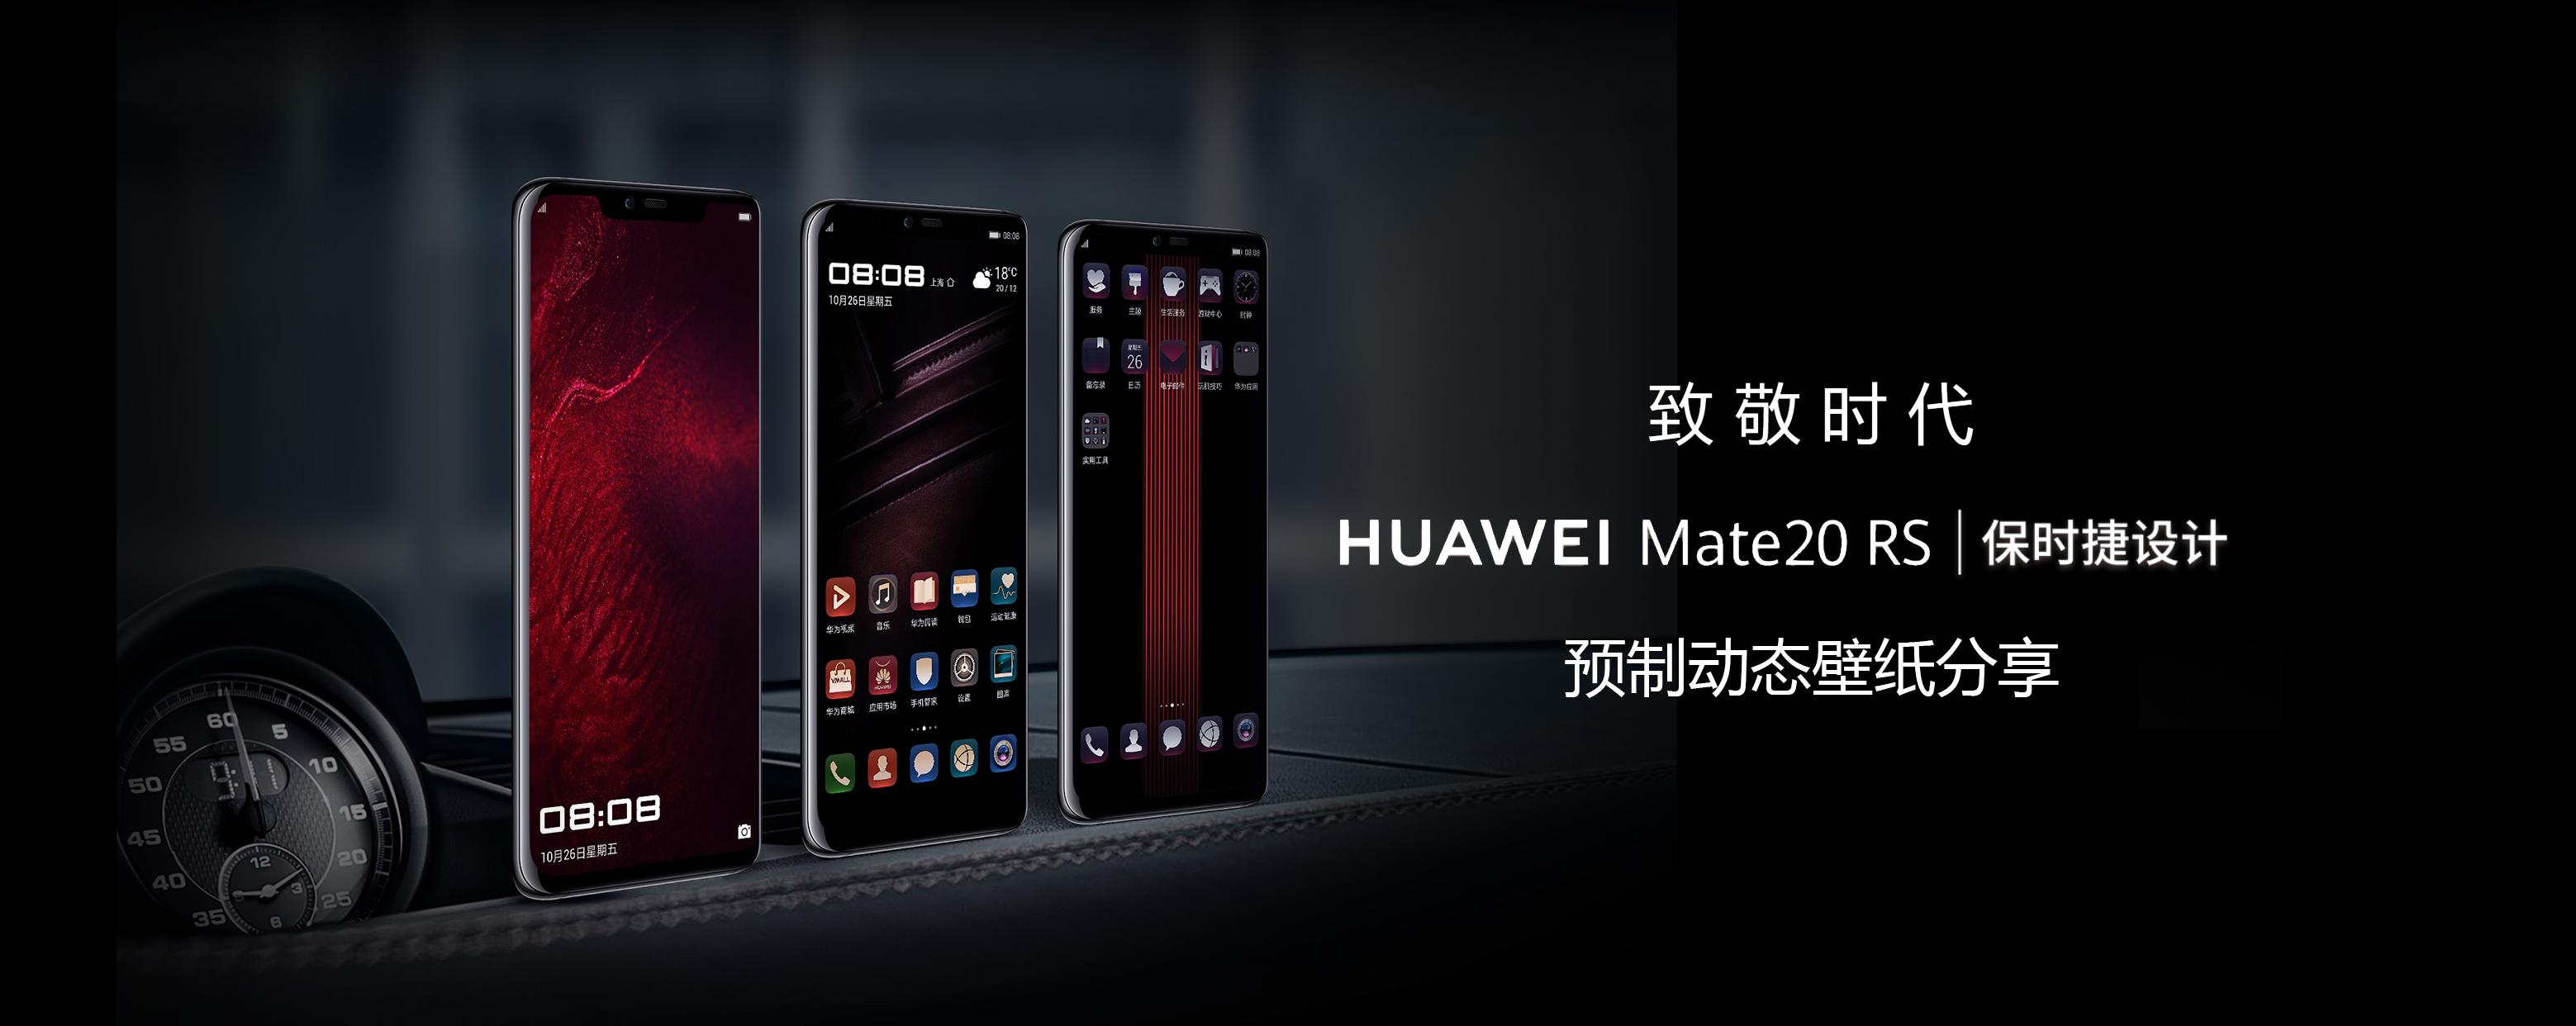 Huawei-Mate-20-RS-cus1.jpg